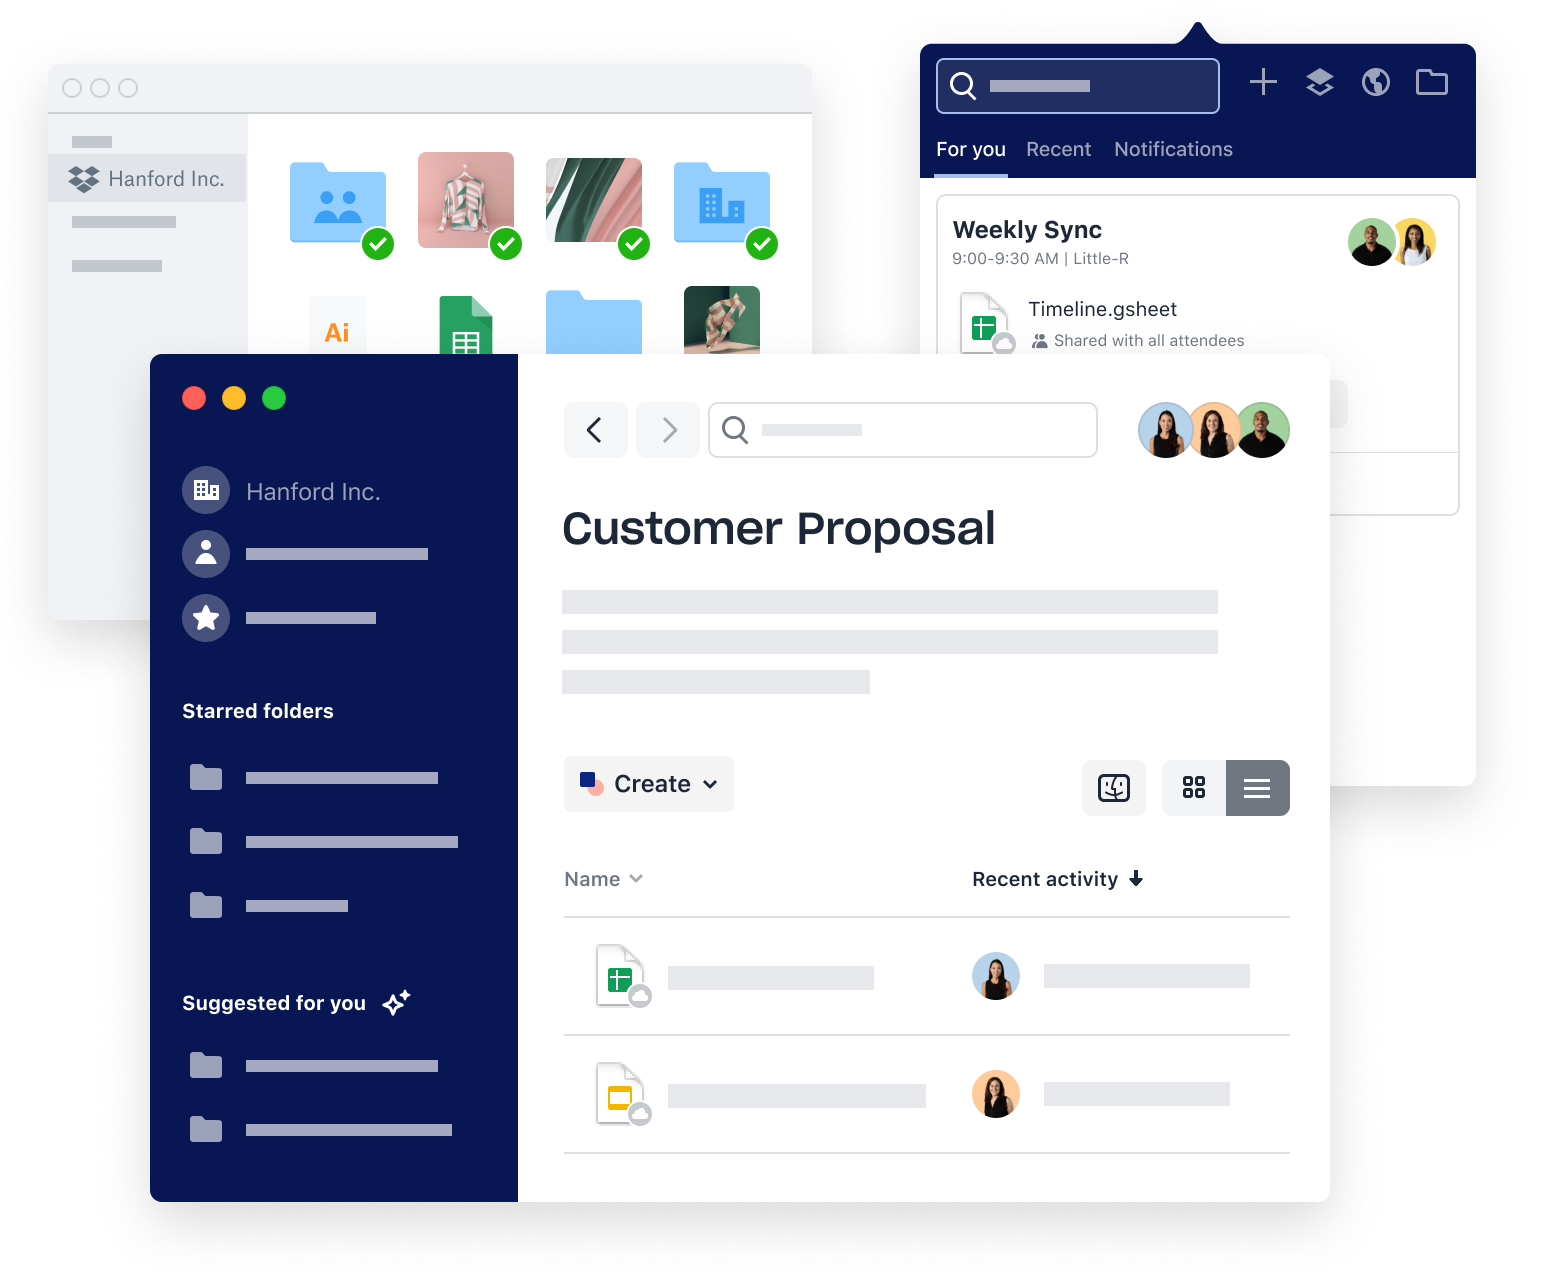 2A_BeOrganized_desktop-app-experience@2x